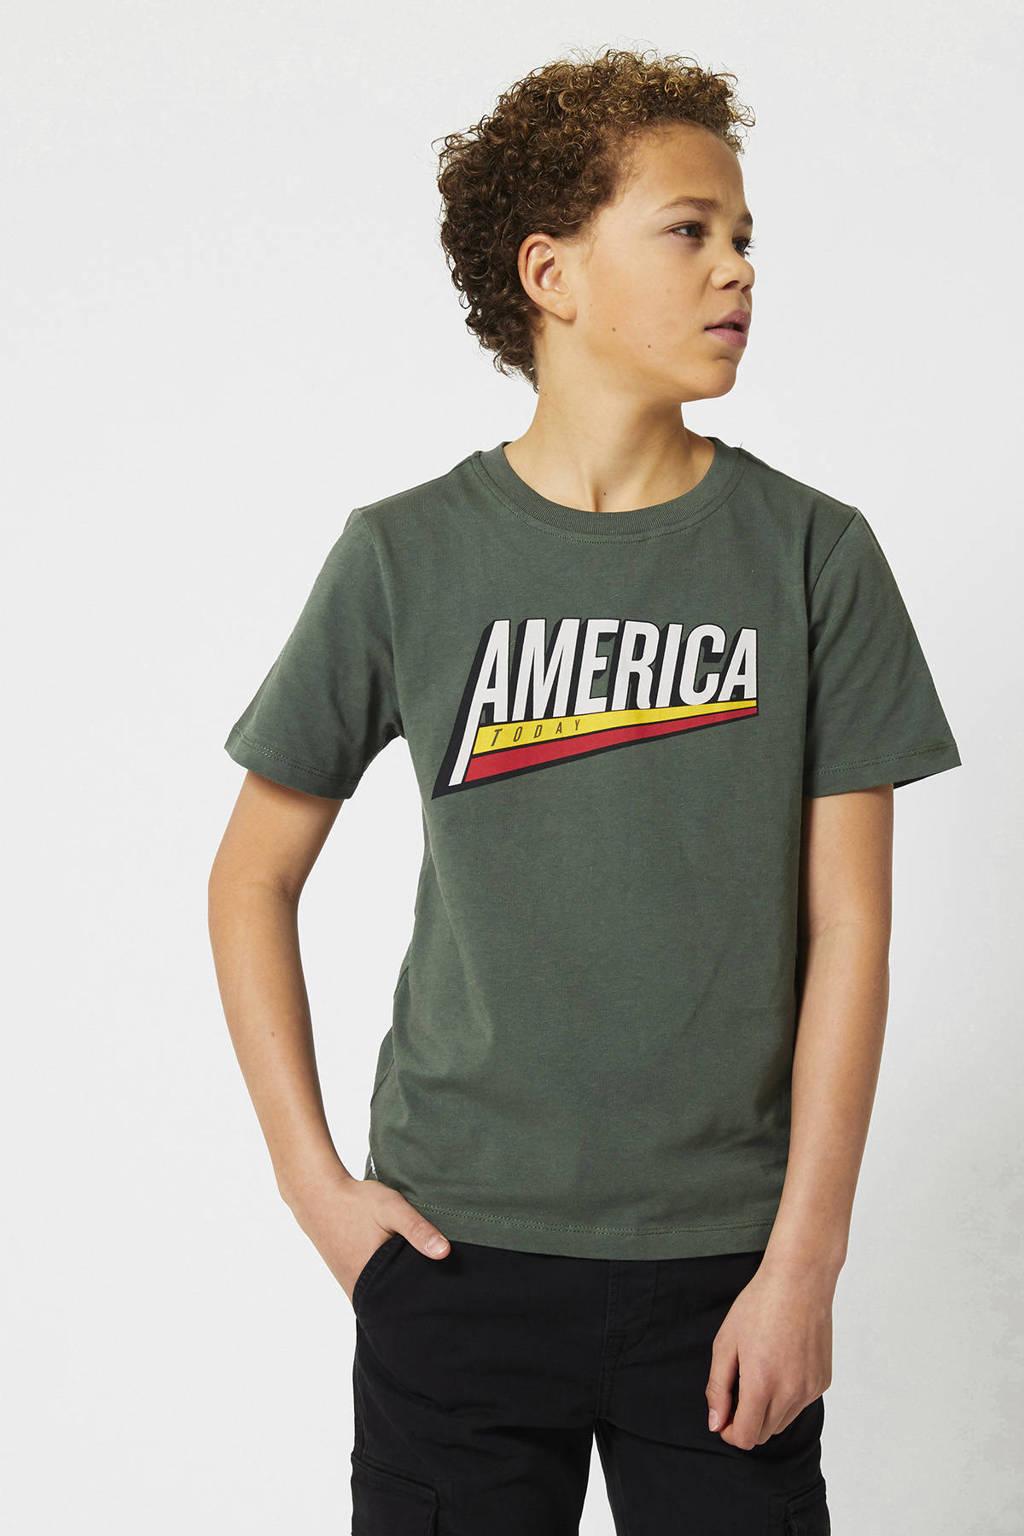 America Today Junior T-shirt met printopdruk legergroen, Legergroen